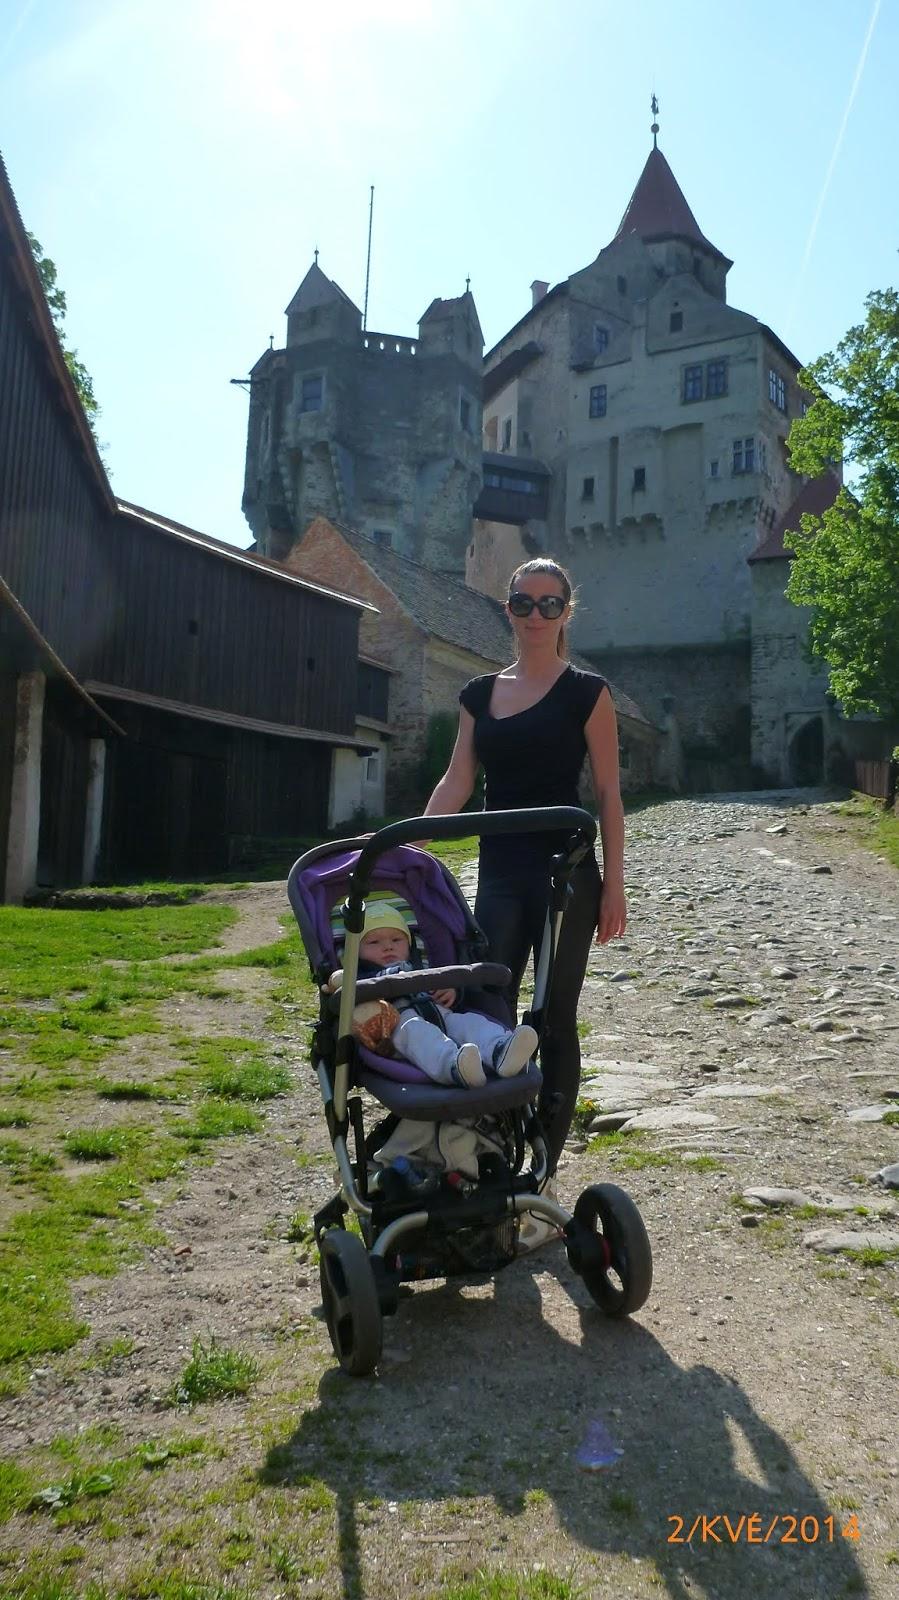 https://www.kempy-chaty.cz/sites/default/files/turistika/hrad_pernstejn.jpg